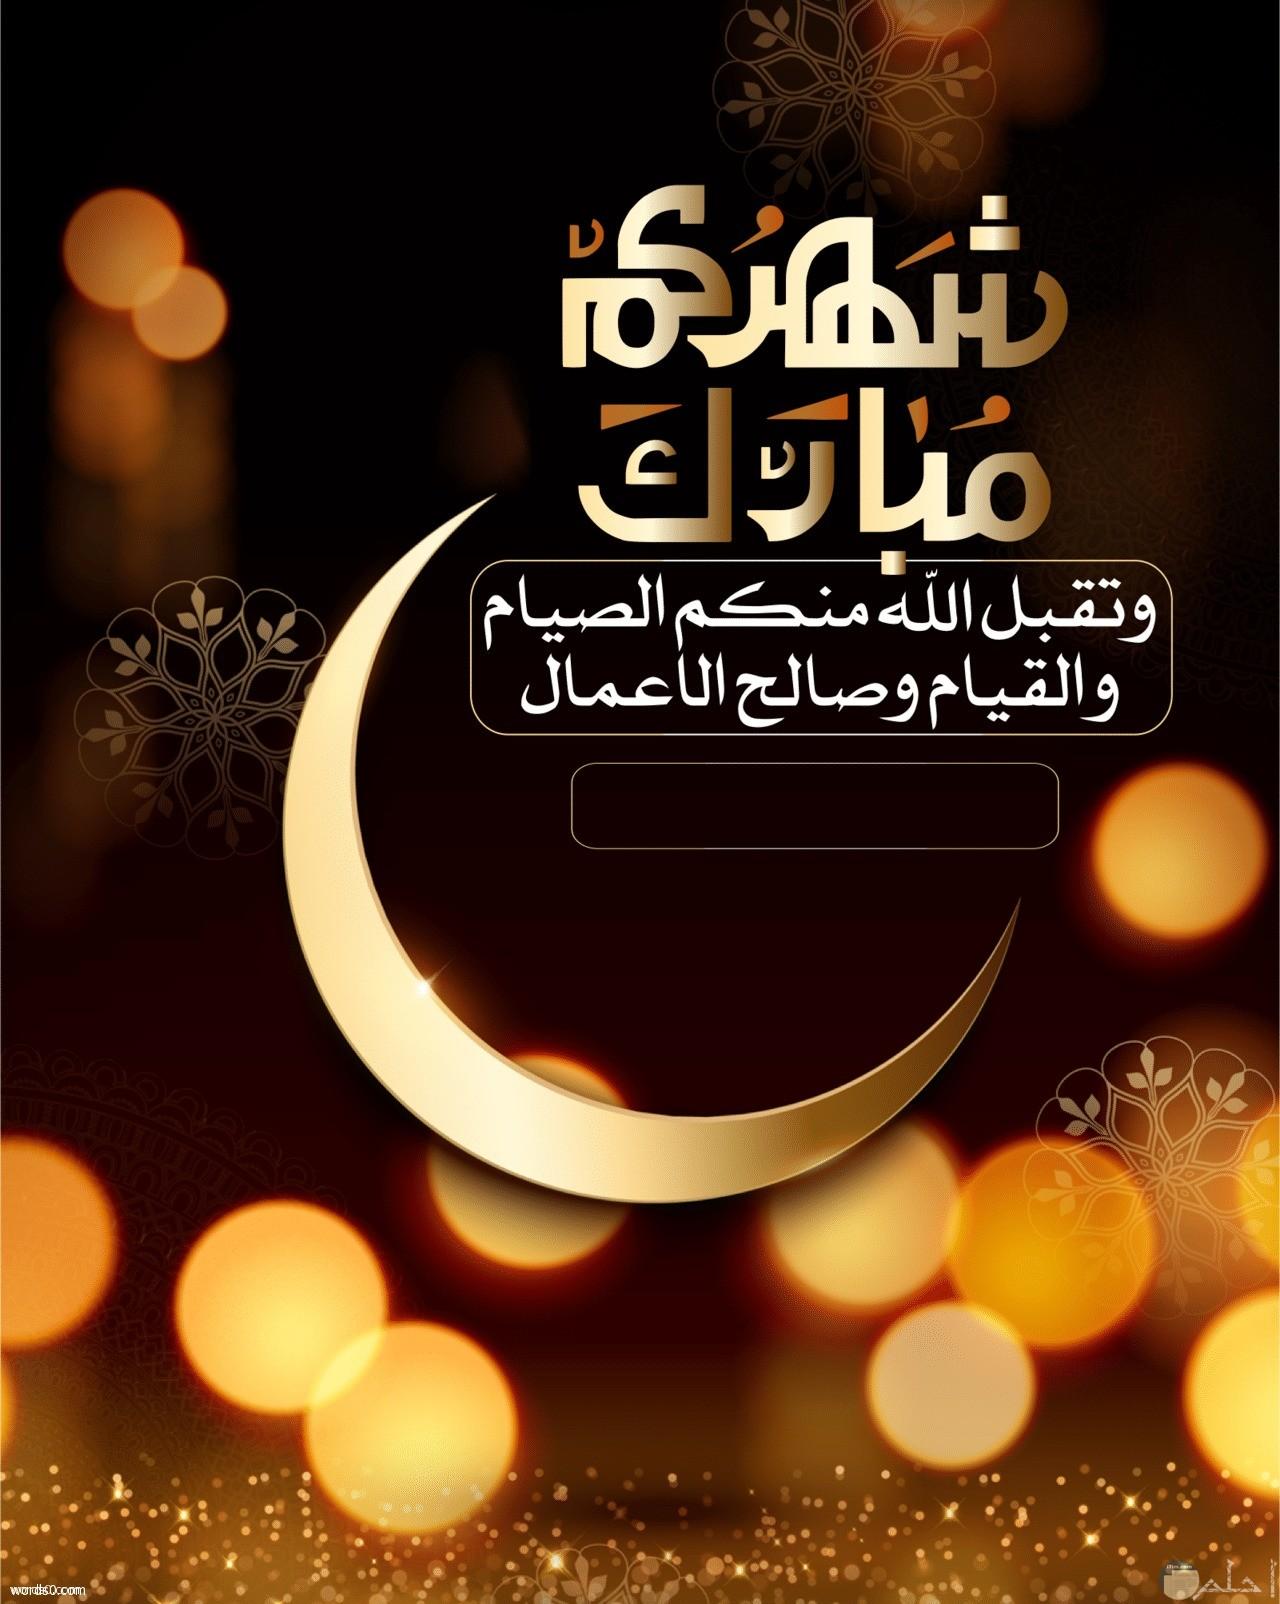 صورة تهنئة و دعوات بشهر رمضان.